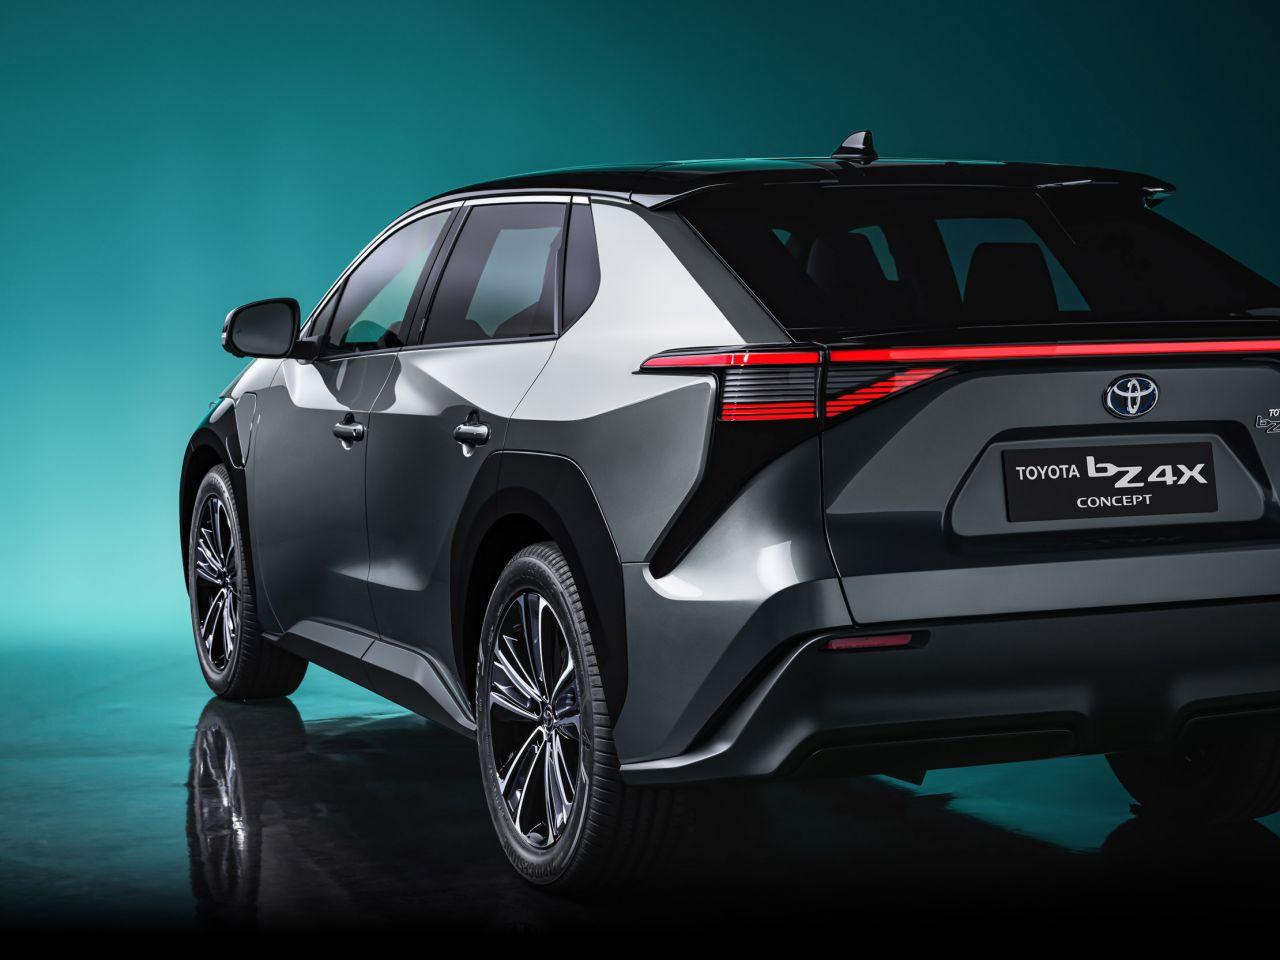 Toyota bZ4X ile yüzde 100 elektrikli otomobil pazarına giriyor - Page 3